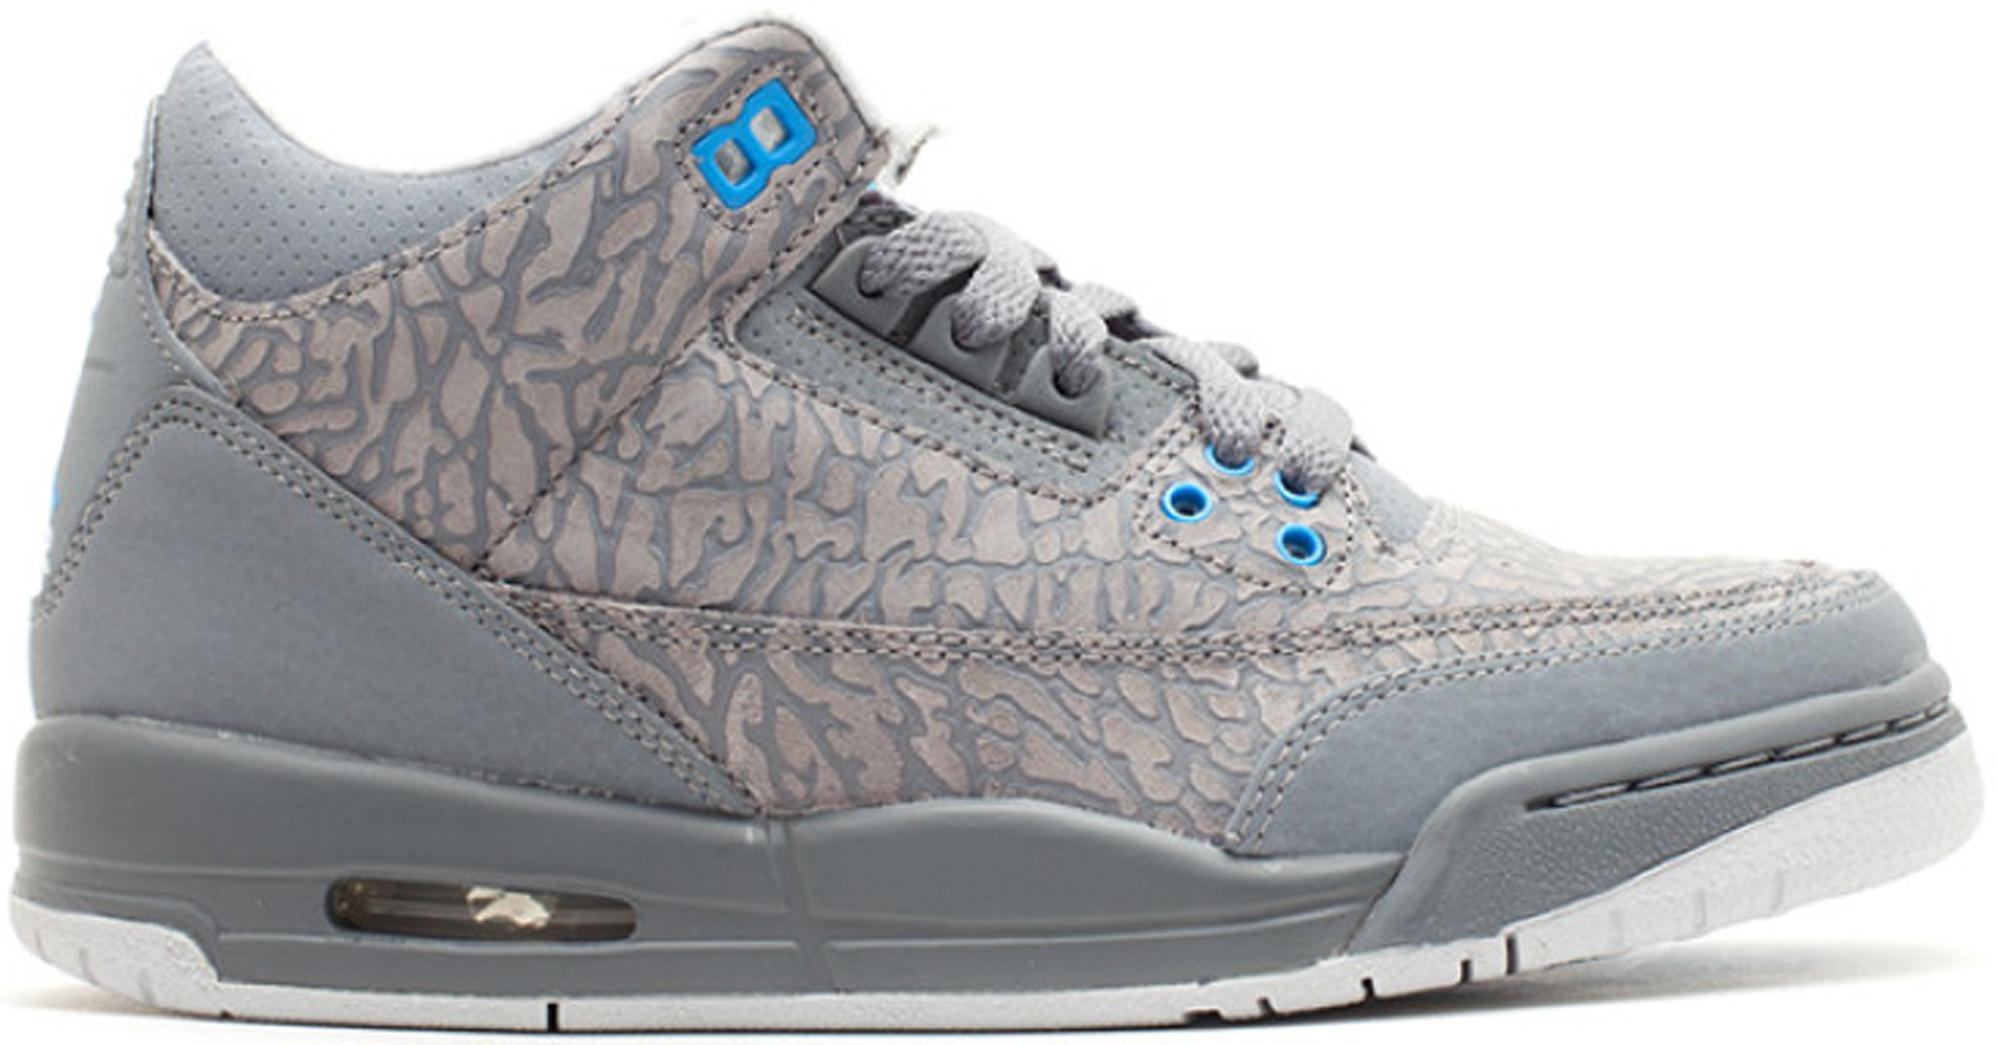 Jordan 3 Retro Flip Cool Grey Blue Glow